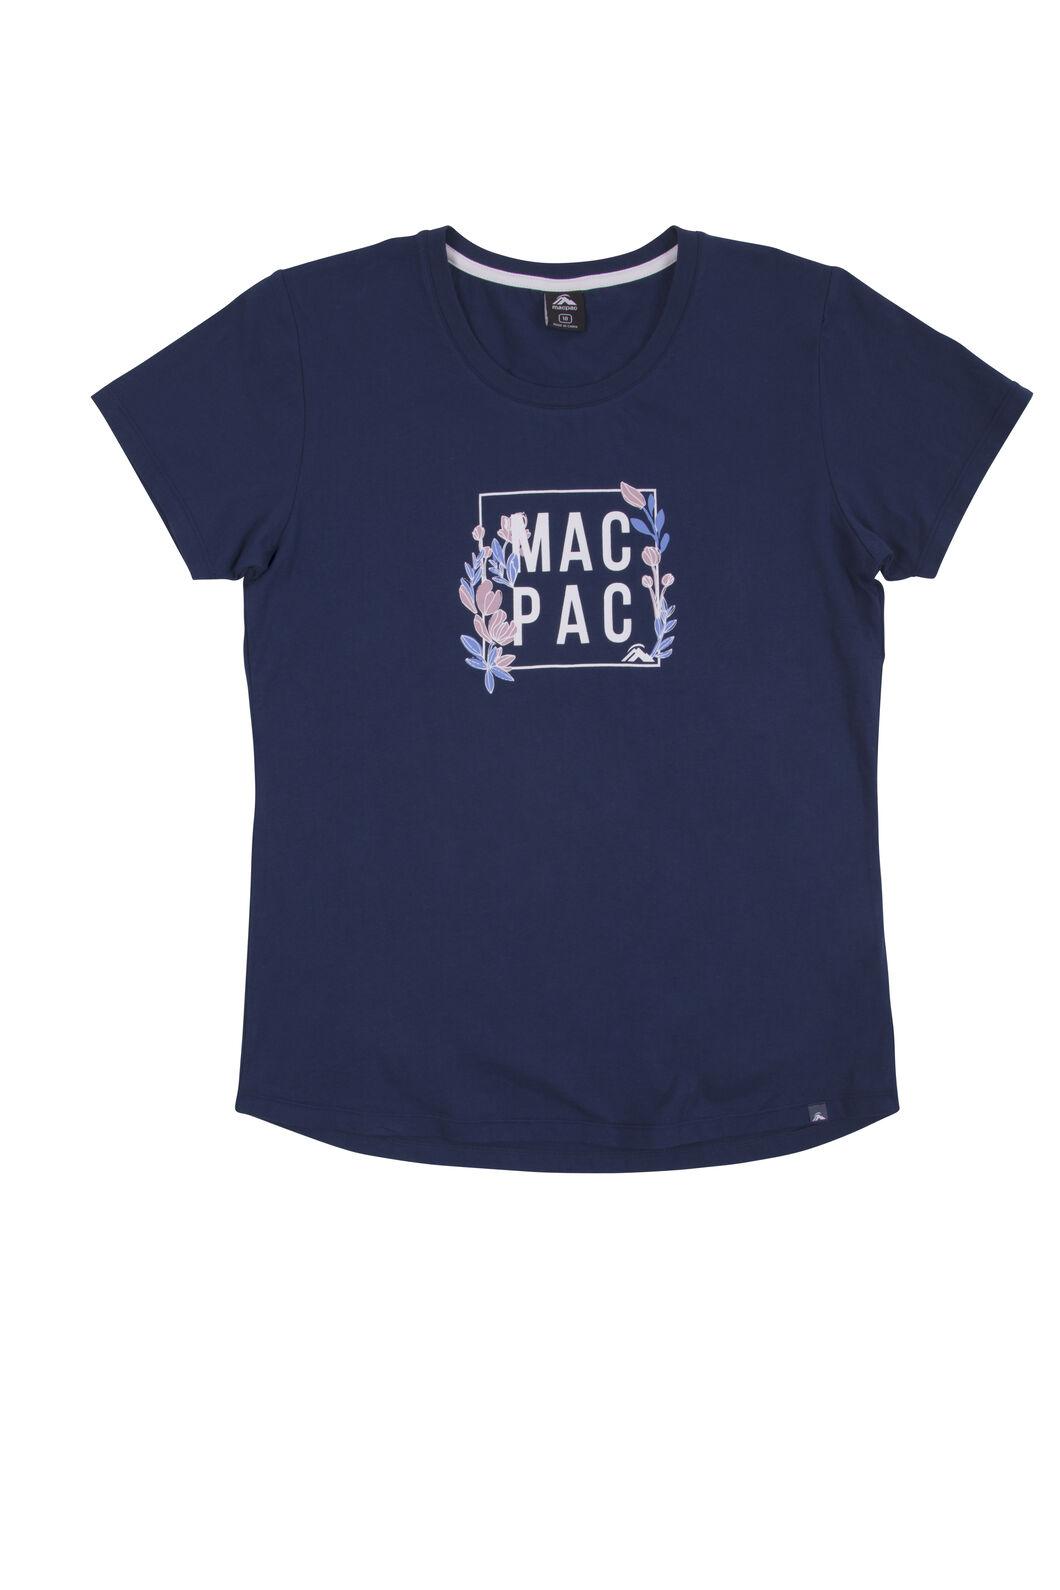 Macpac Cubed Organic Cotton Tee - Women's, Medieval Blue, hi-res